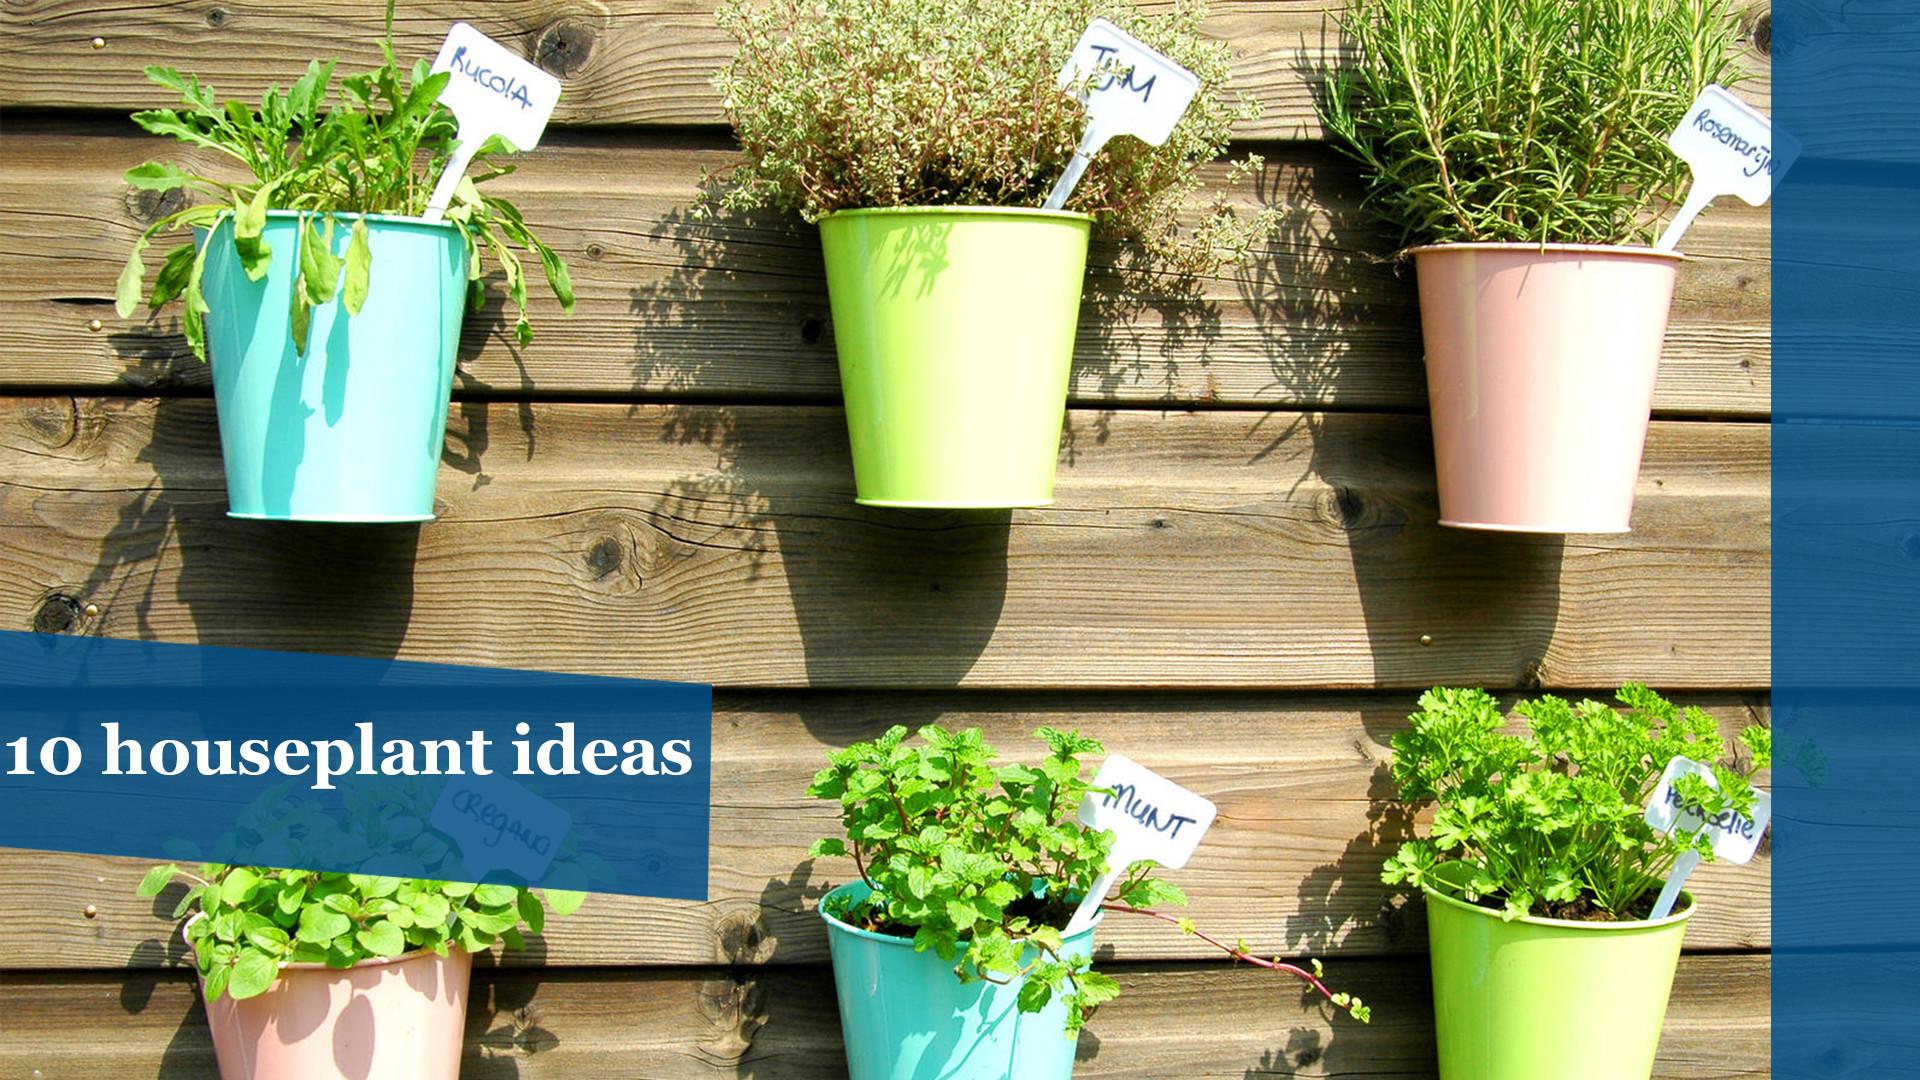 Go green: 10 fun houseplant ideas